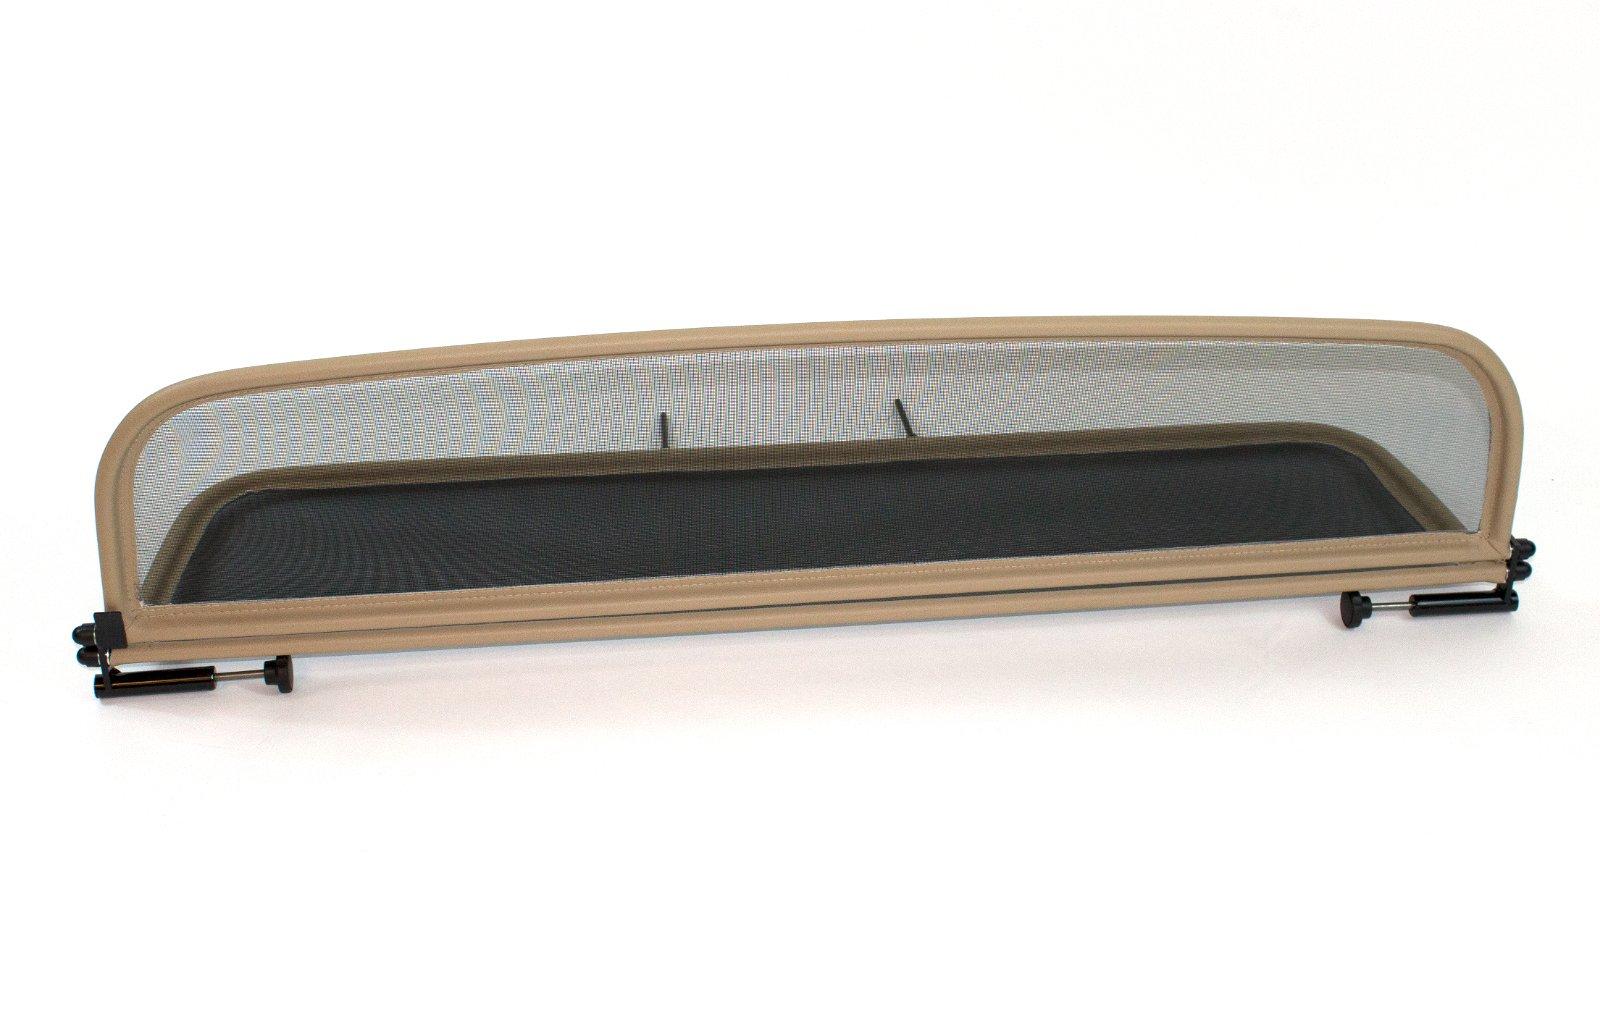 Wind Deflector for Jaguar XK (2006-2014) - Foldable - with Quick Release Fastener - Beige | Windstop | Wind Blocker